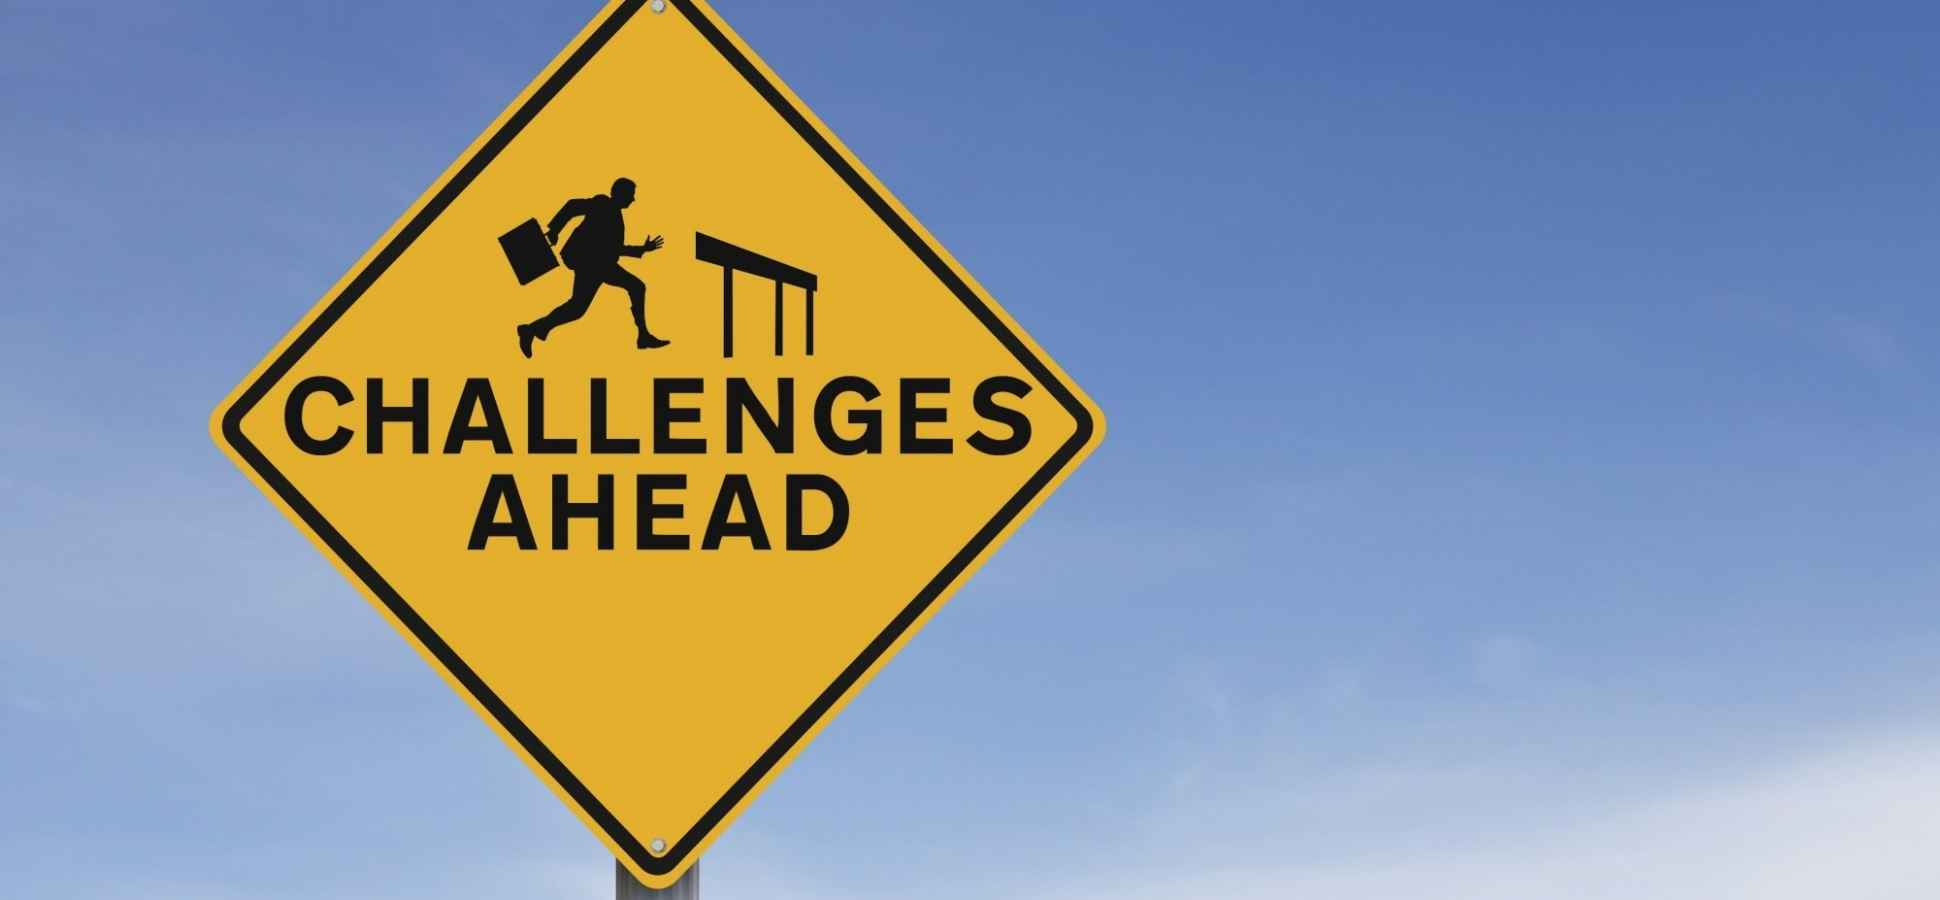 3 Major Roadblocks Limiting Your Team's Success